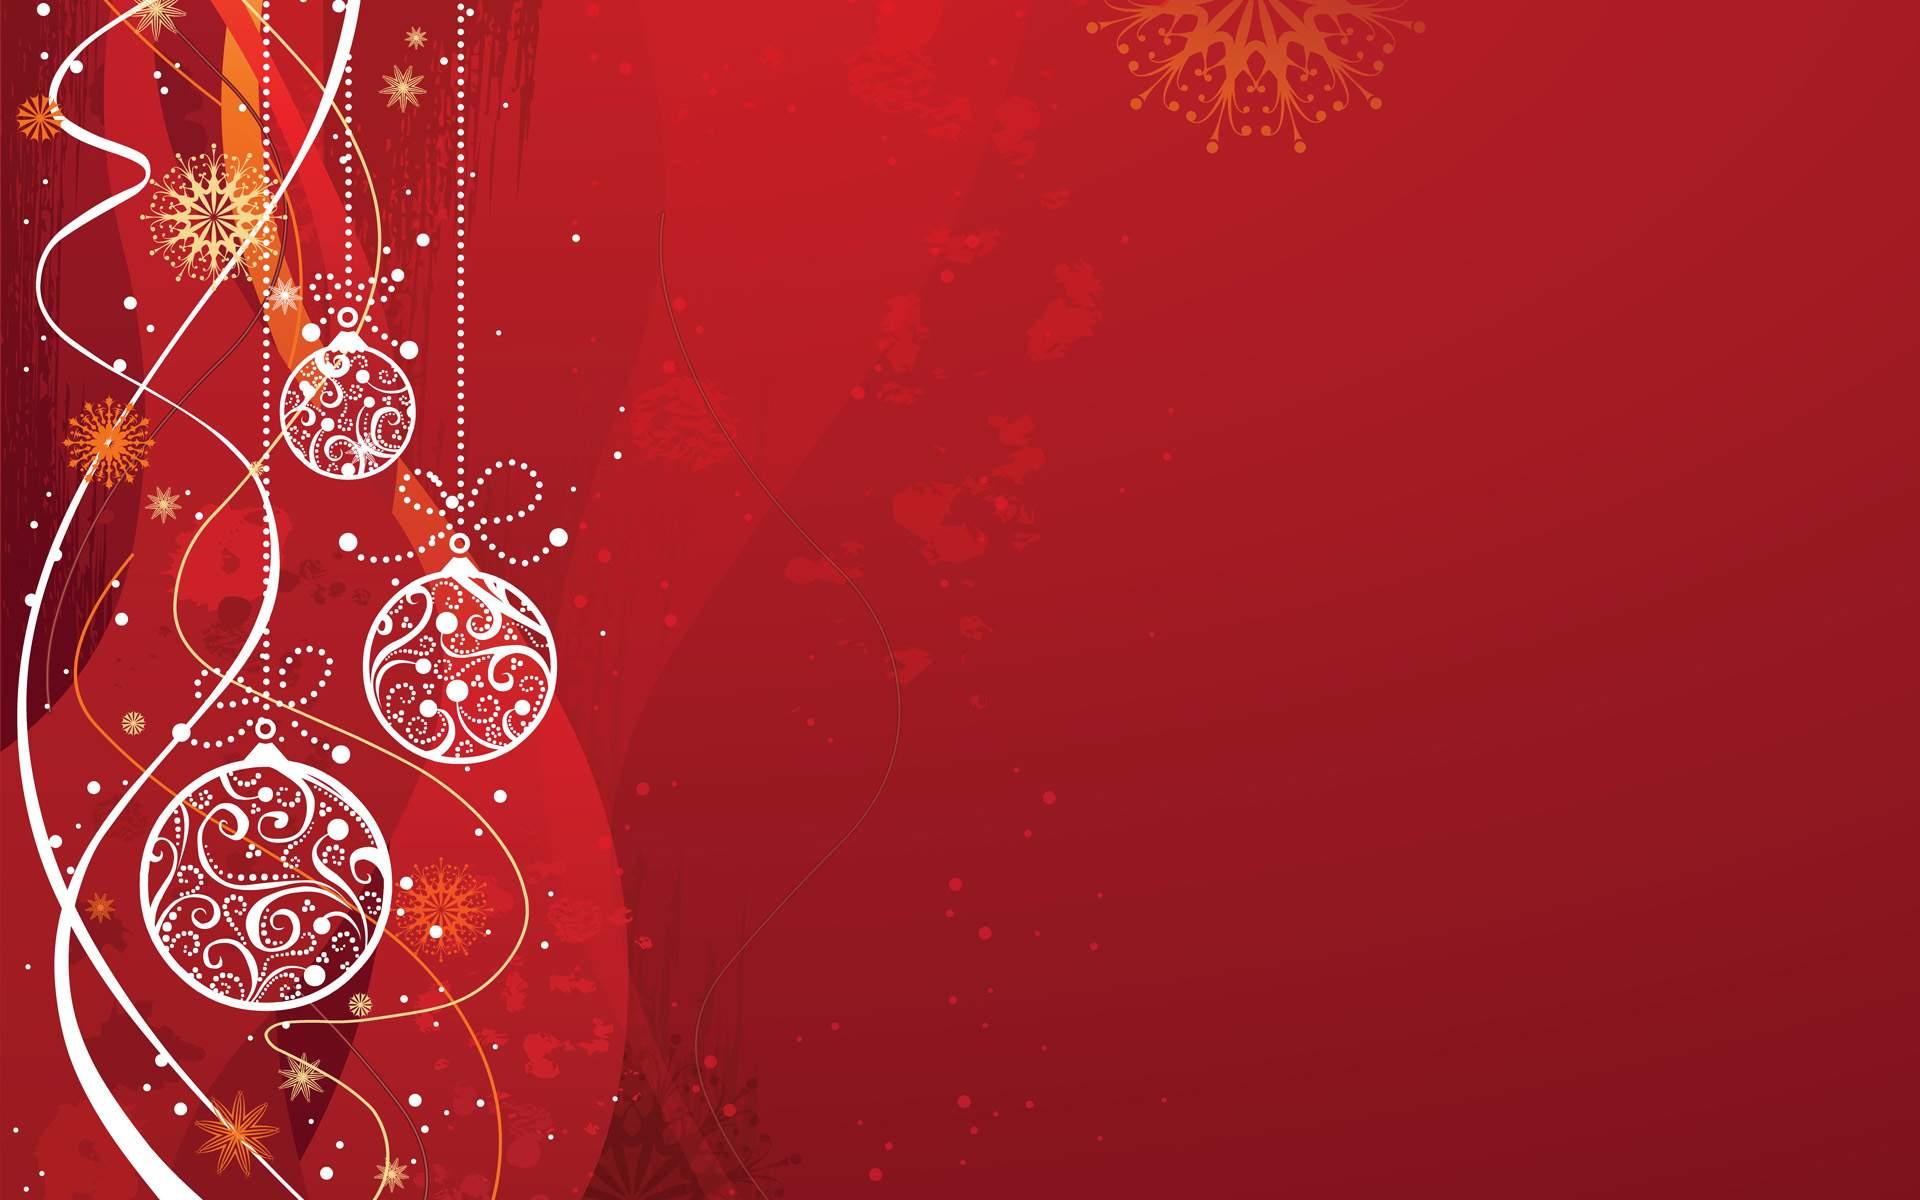 Free Backgrounds Christmas - WallpaperSafari